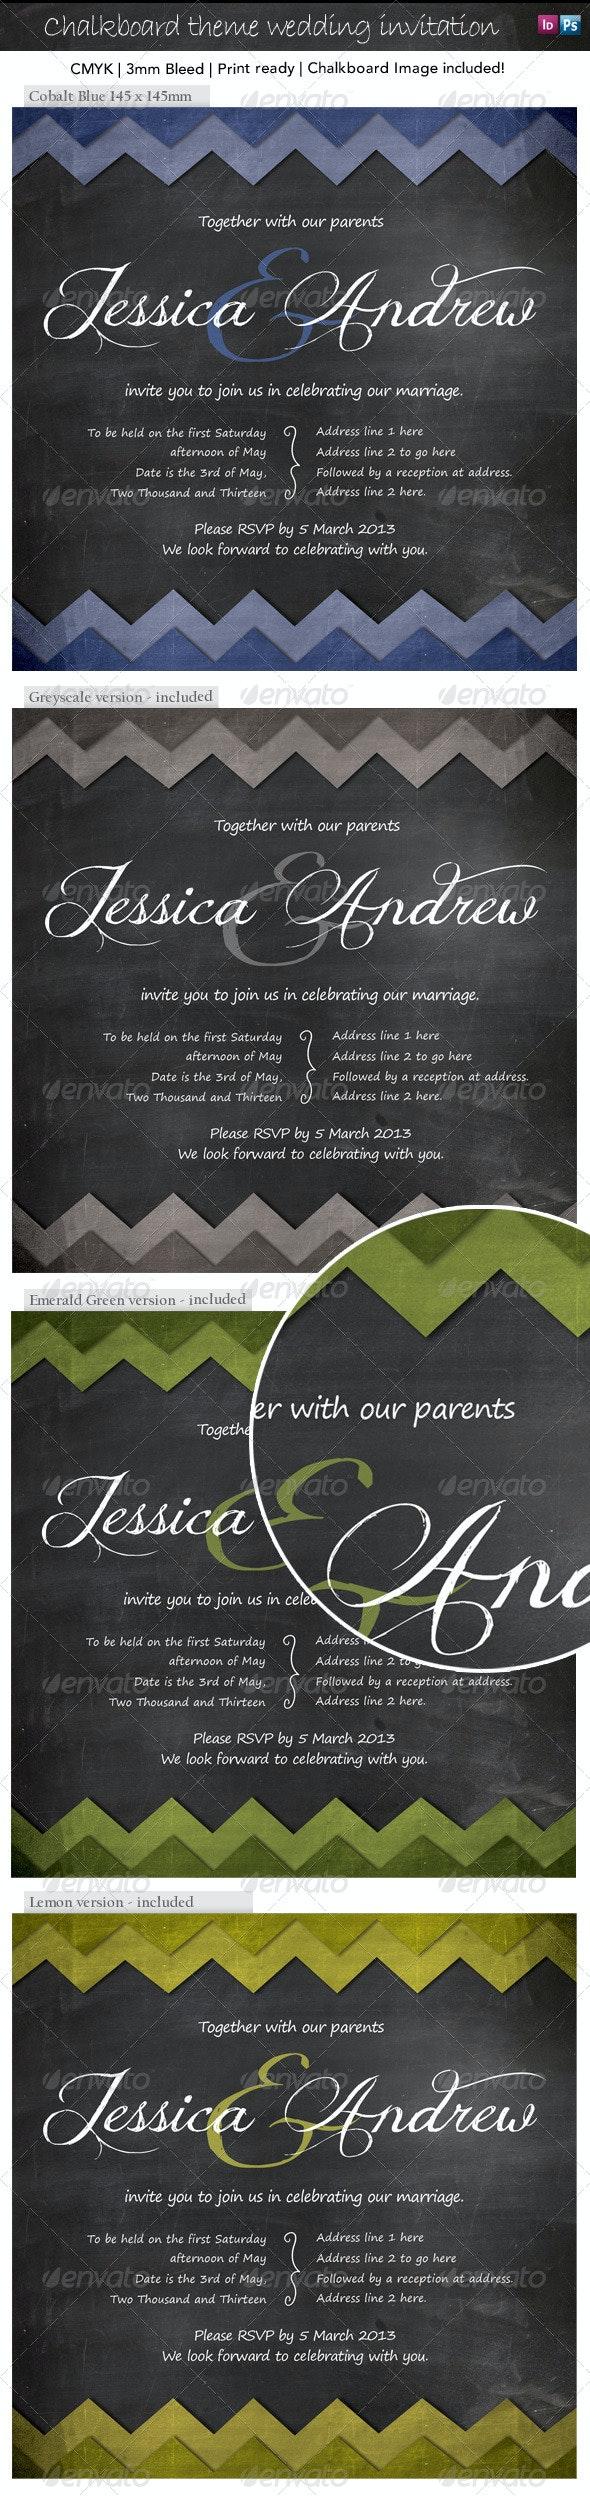 Blackboard invitation for wedding or special event - Invitations Cards & Invites